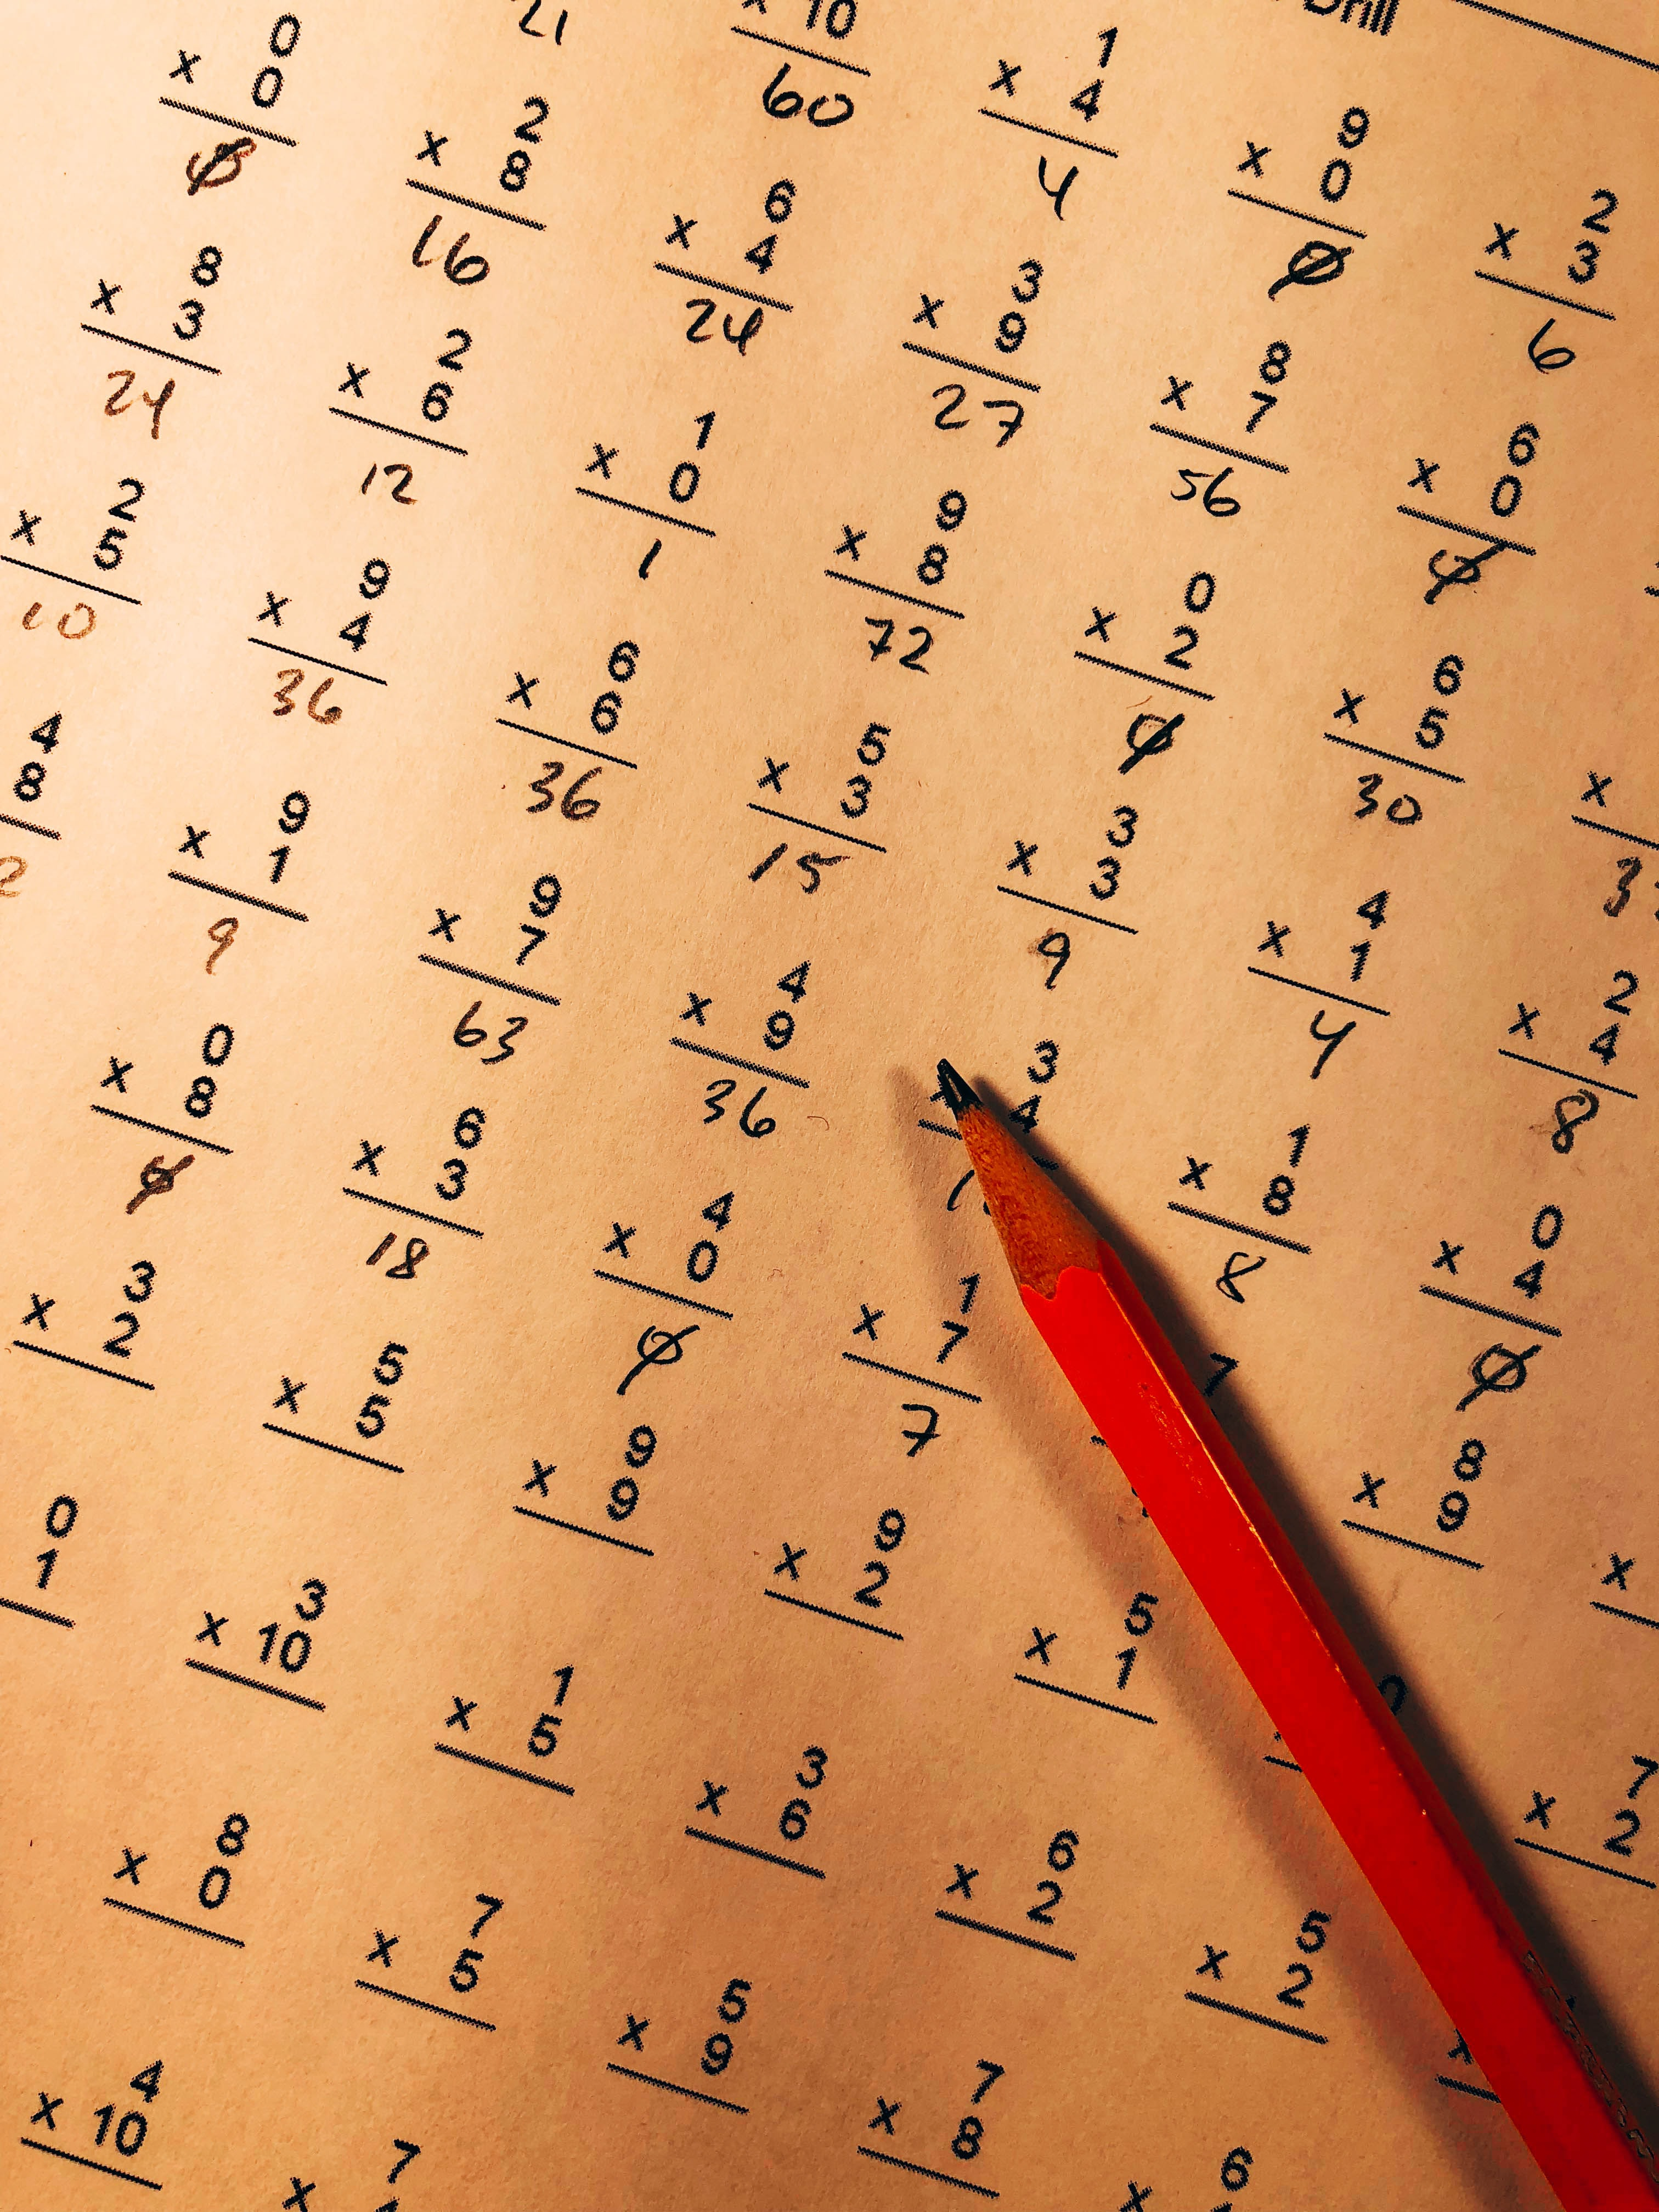 Pencil resting on a multiplication test. Photo courtesy of Chris Liverani on Unsplash/.